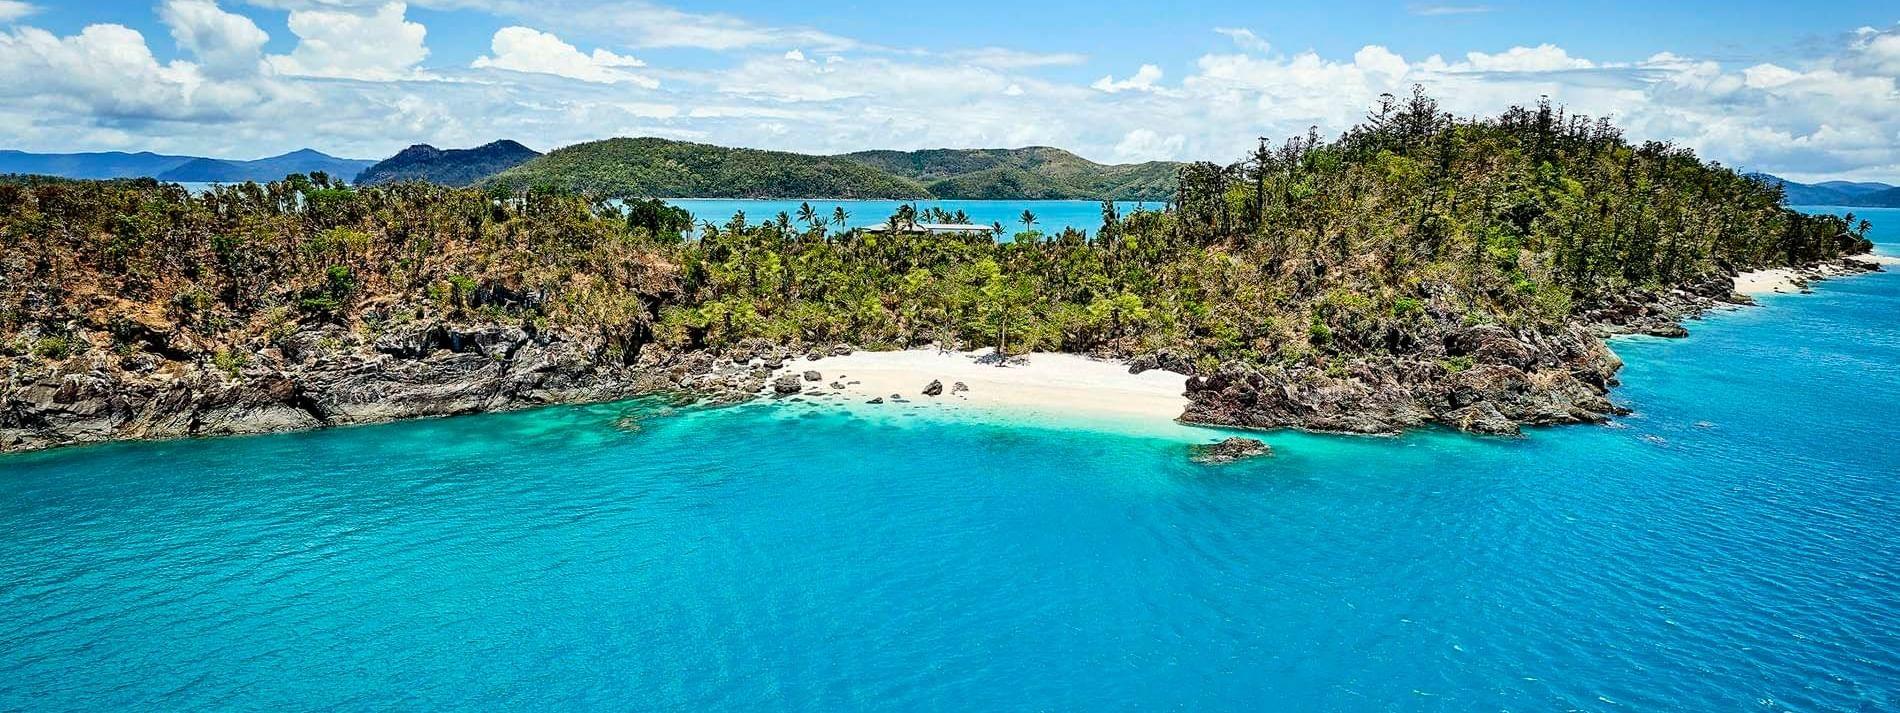 View of island with trees near Daydream Island Resort